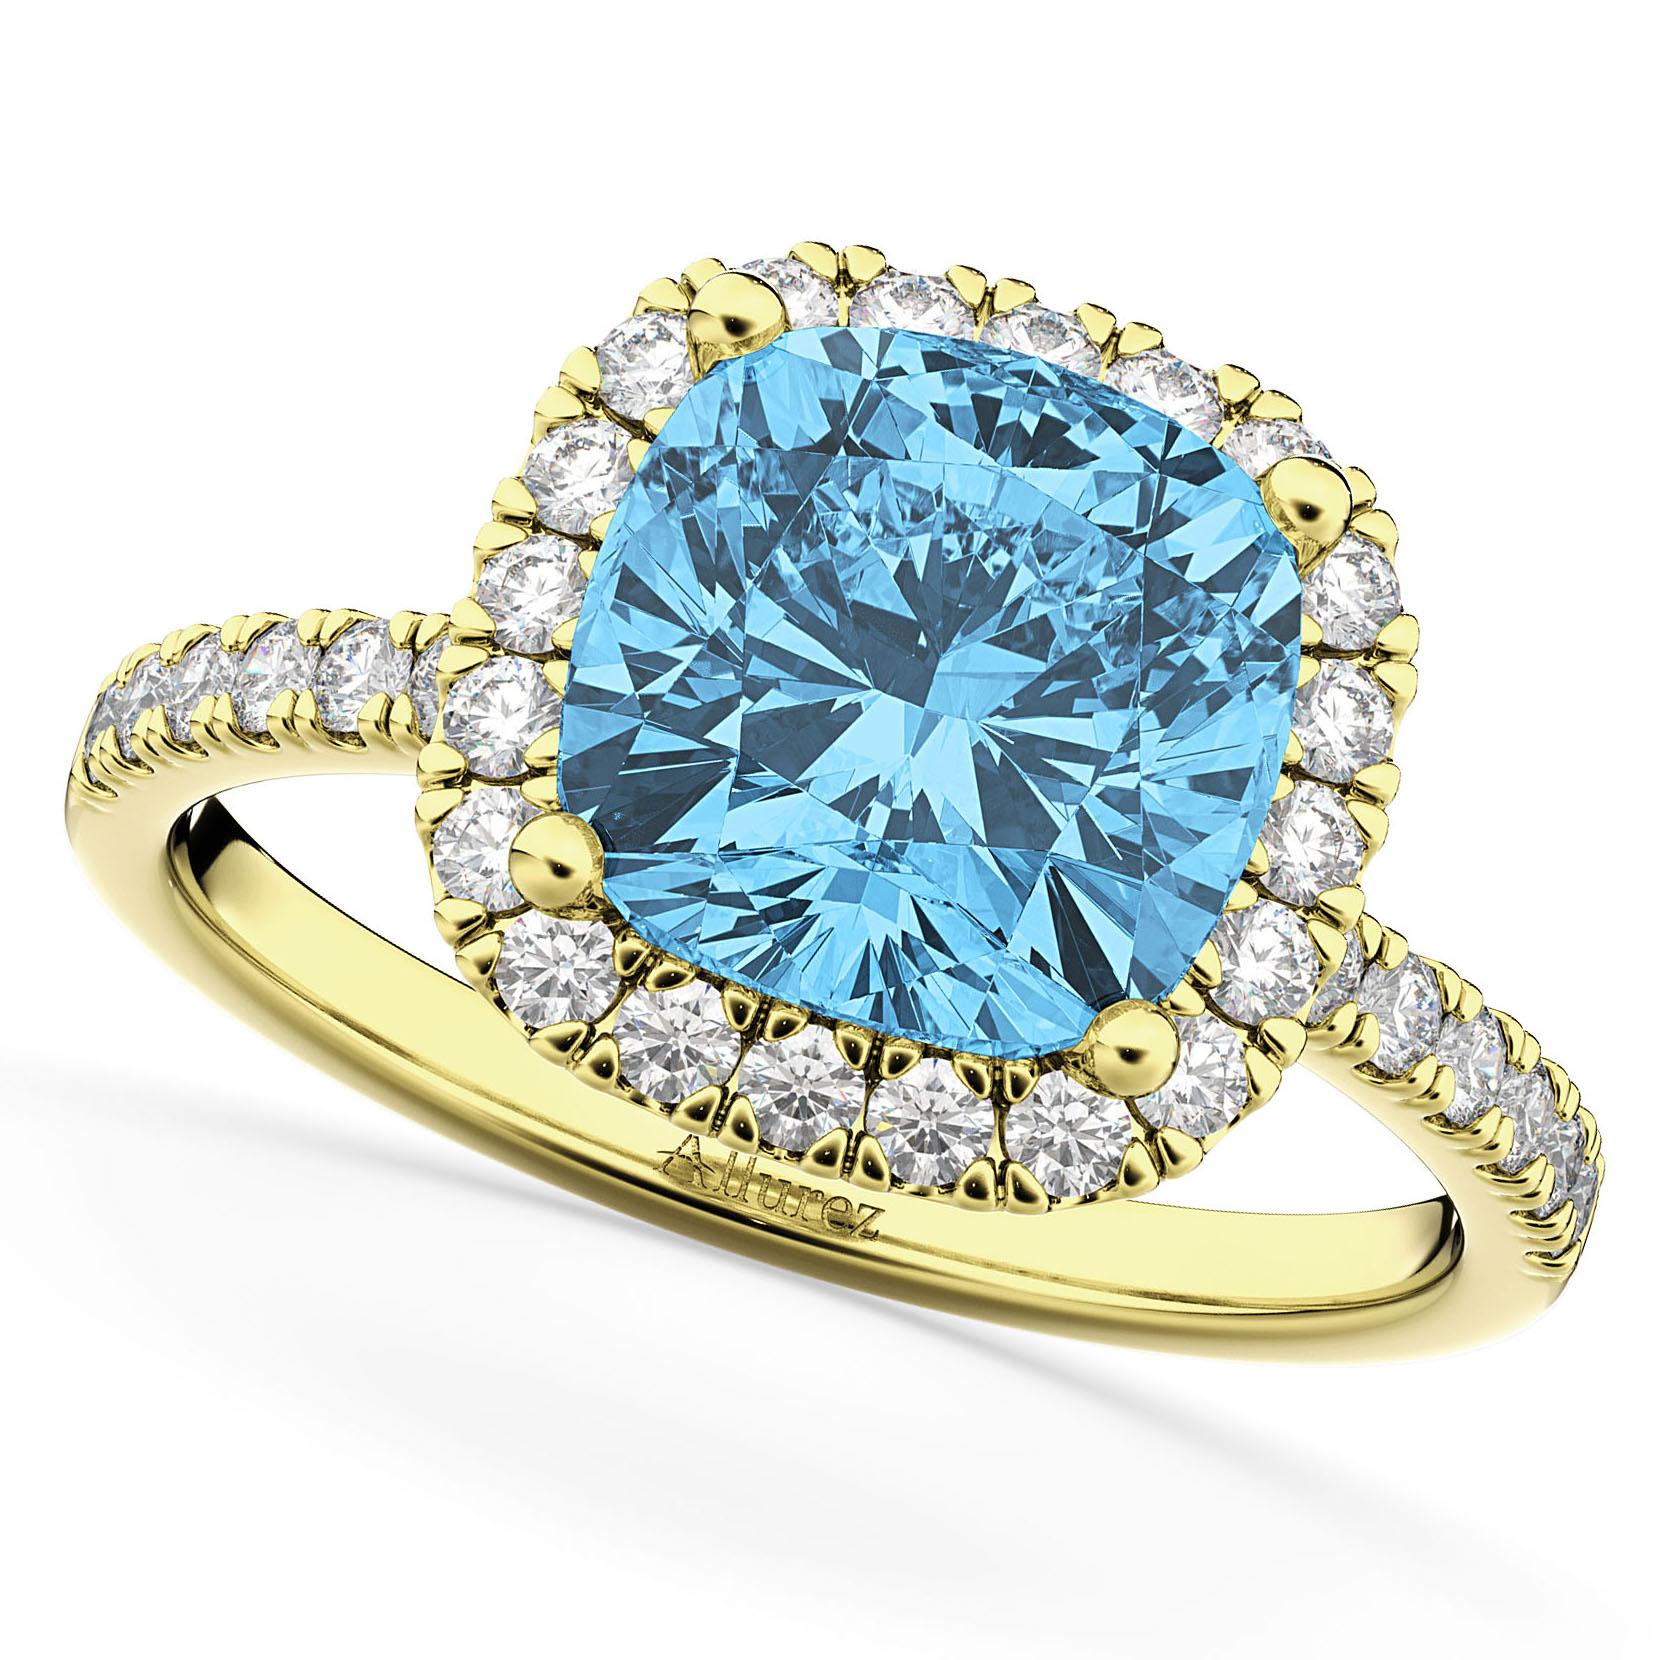 Cushion Cut Halo Blue Topaz & Diamond Engagement Ring 14k Yellow Gold (3.11ct)